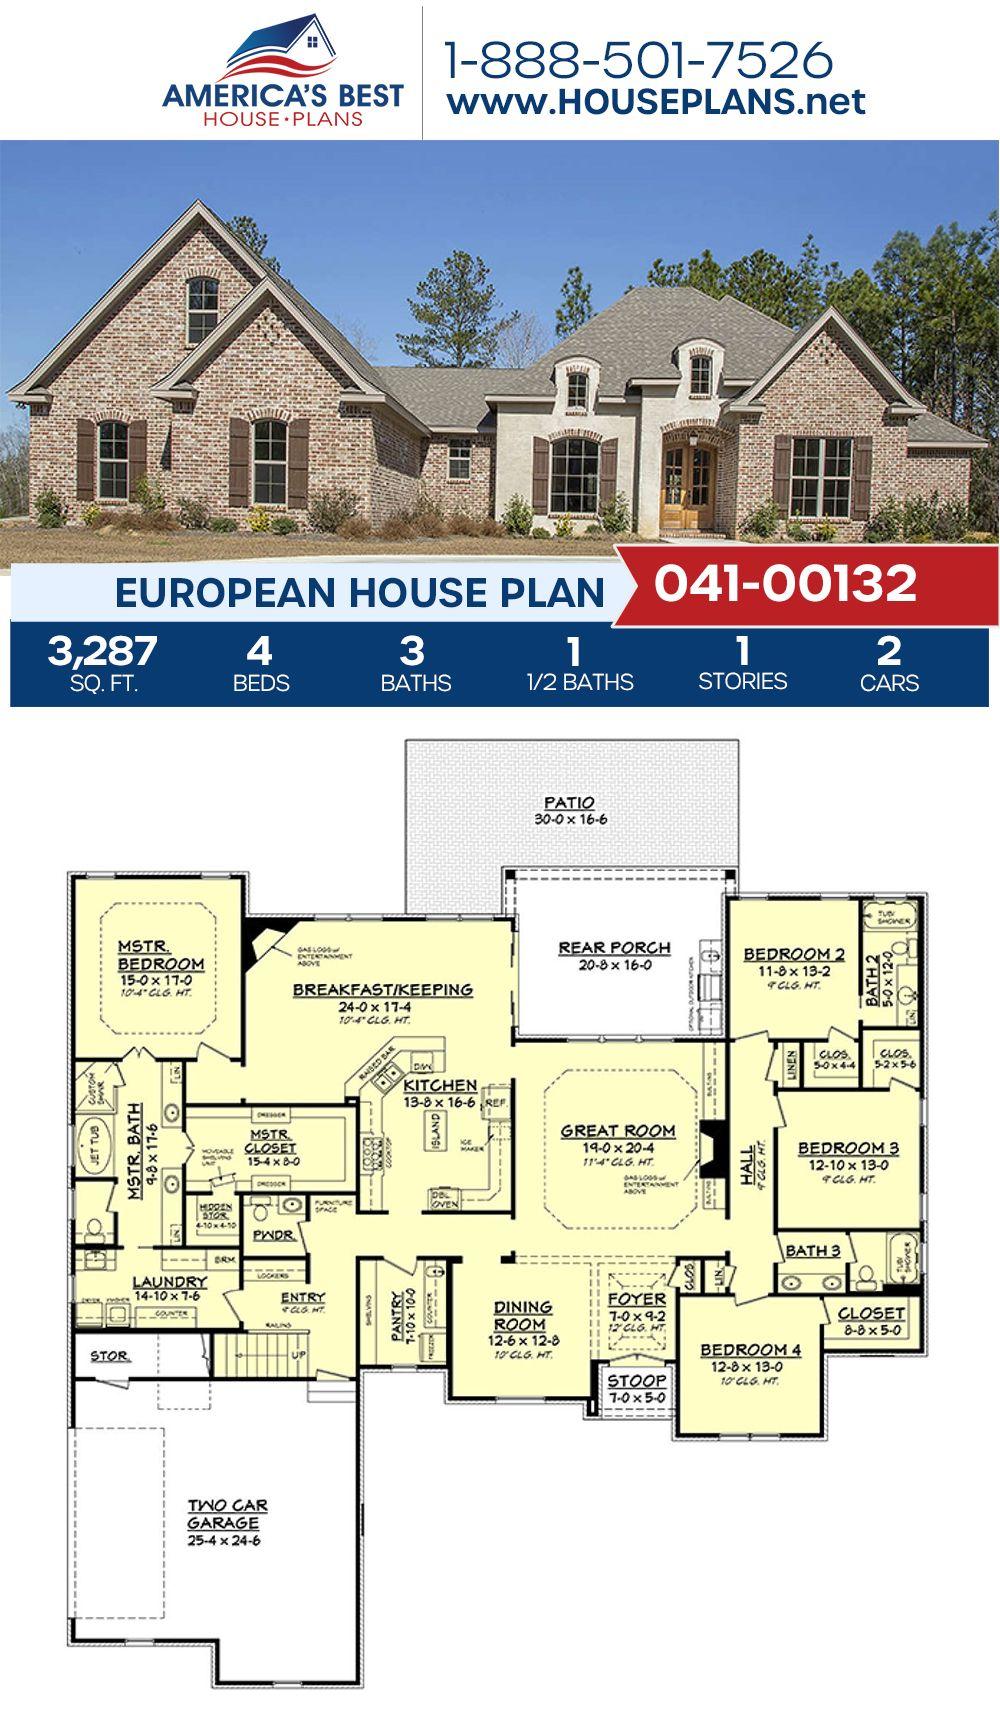 House Plan 041 00132 European Plan 3 287 Square Feet 4 Bedrooms 3 5 Bathrooms European Plan House Plans Best House Plans